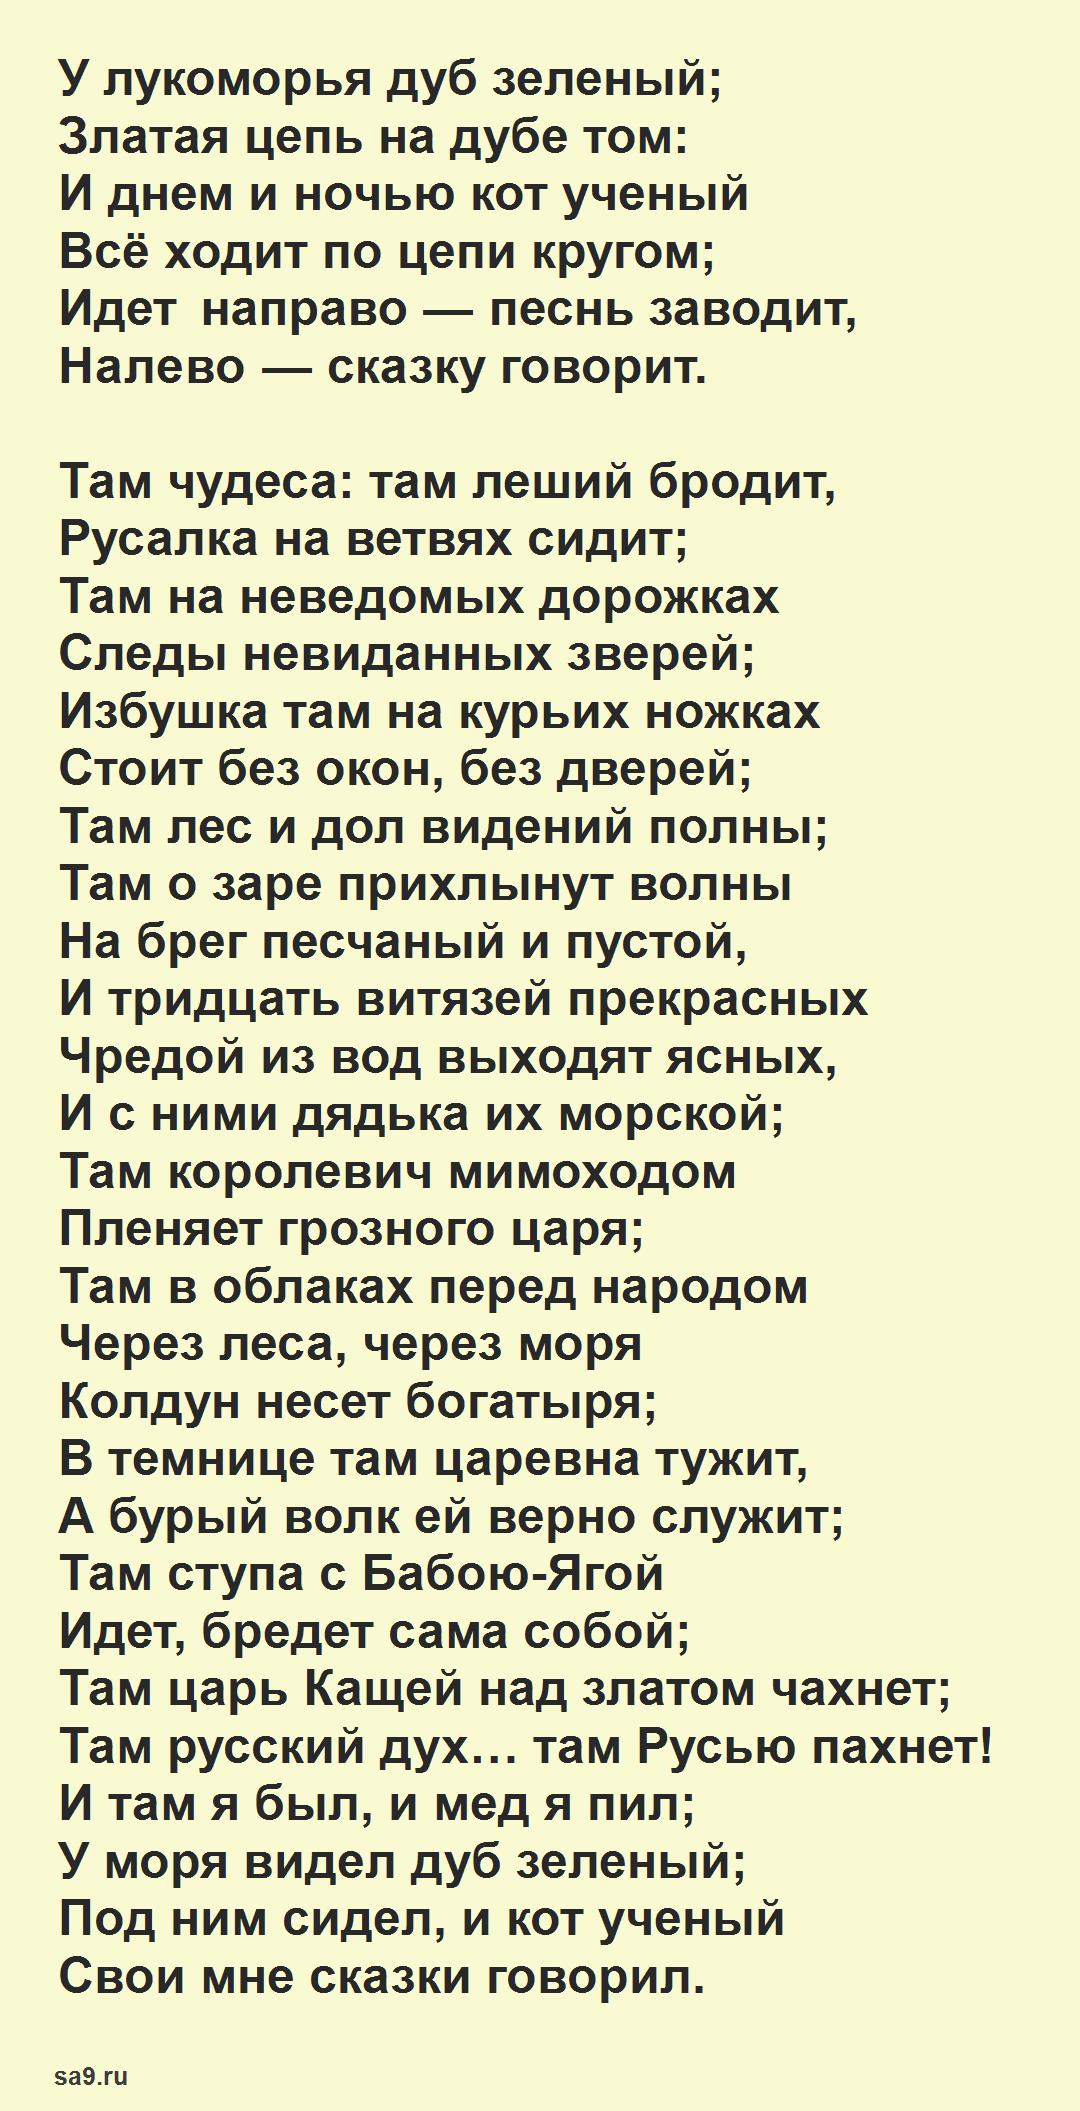 Стихи Пушкина про лето - У лукоморья дуб зеленый